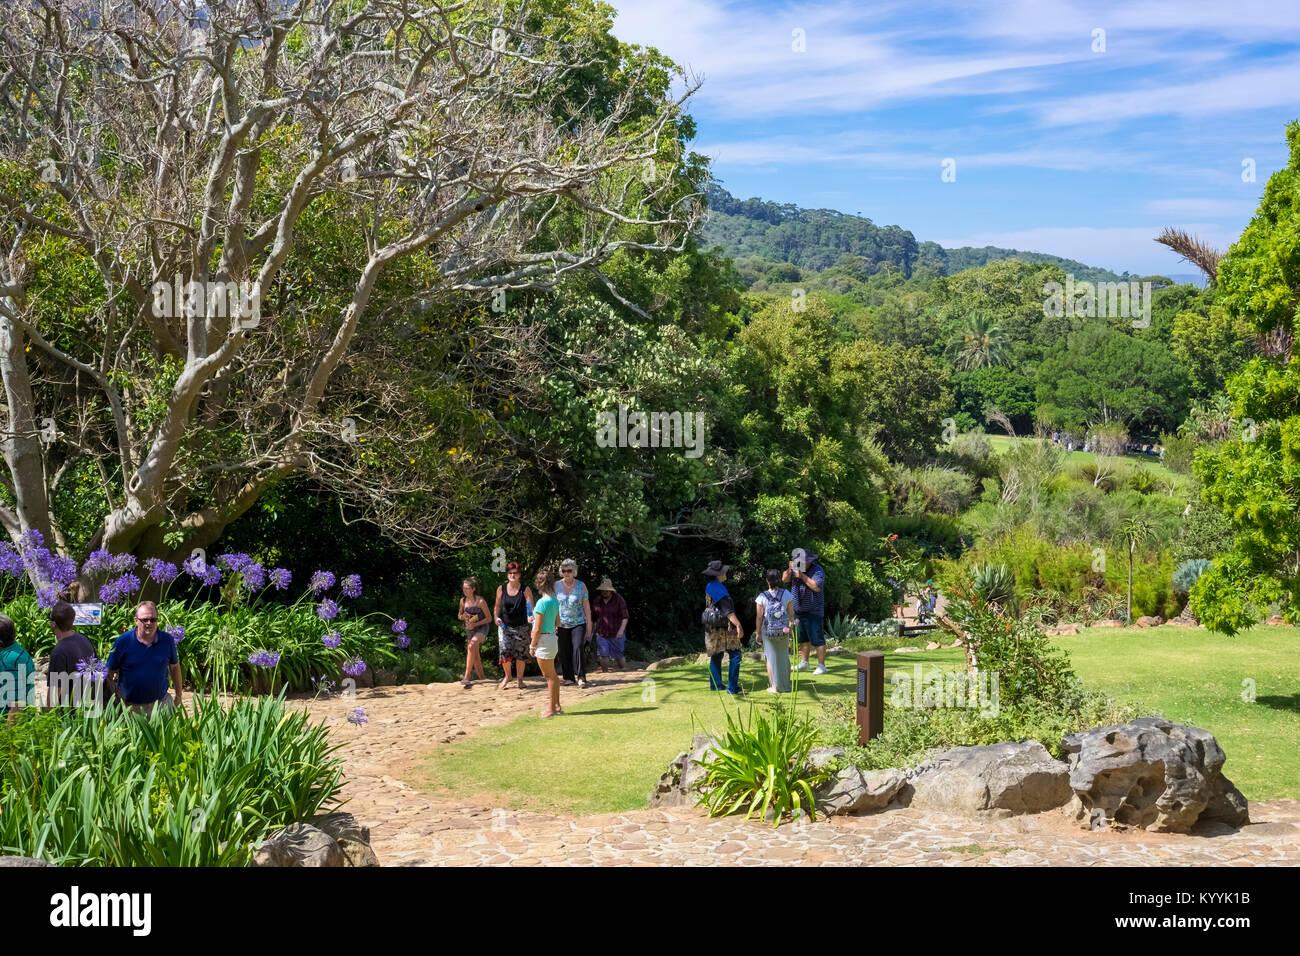 Kirstenbosch National Botanical Gardens, Newlands, Cape Town, South Africa - Stock Image